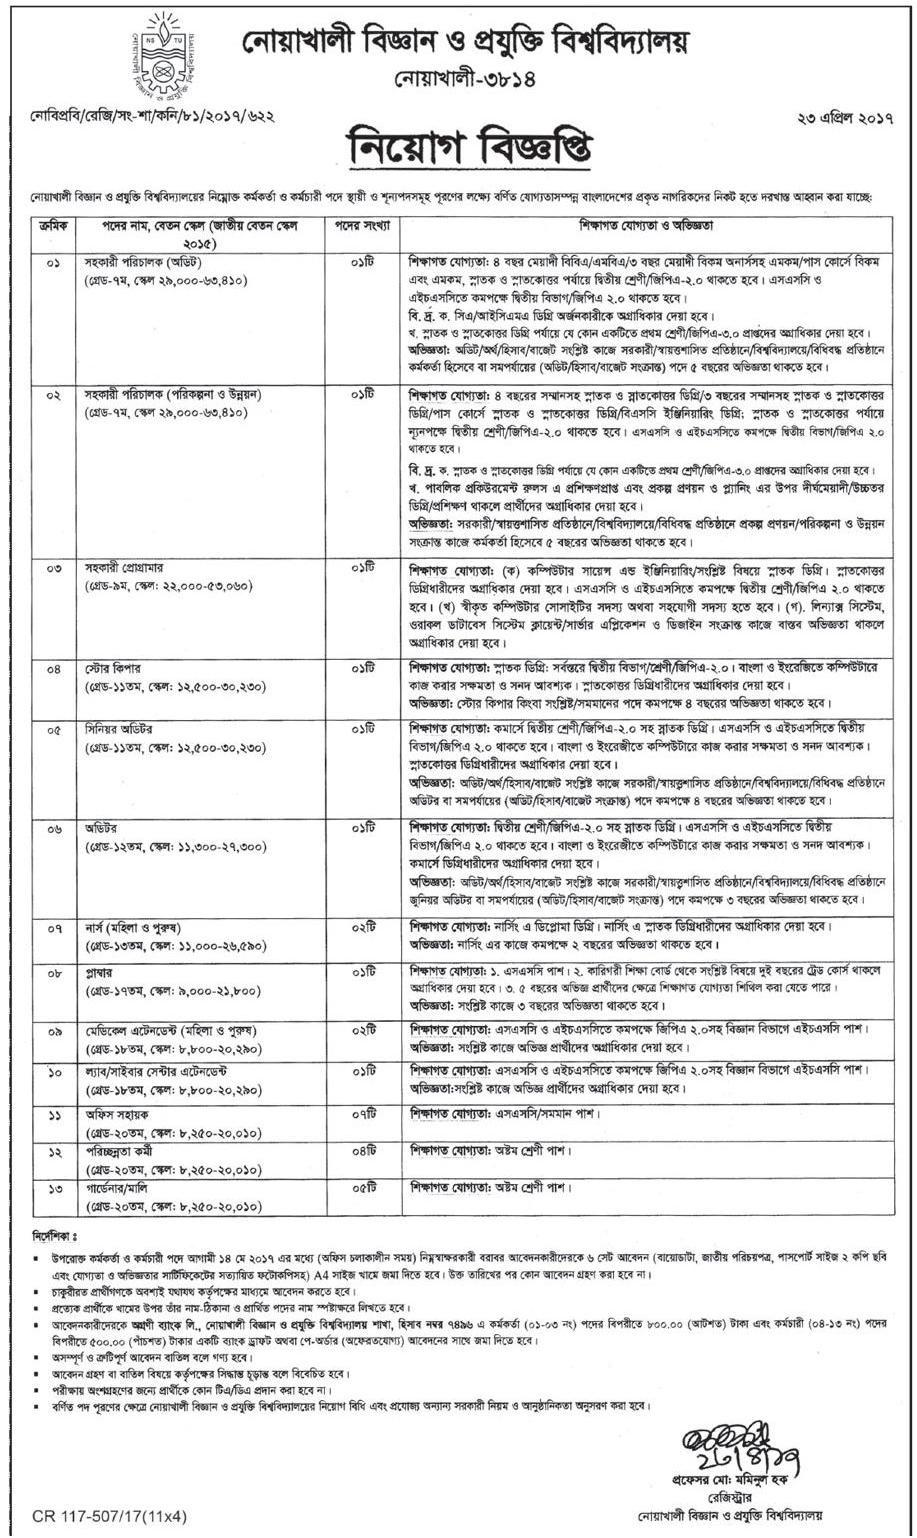 oakhali Science and Technology University (NSTU) Job Circular 2017